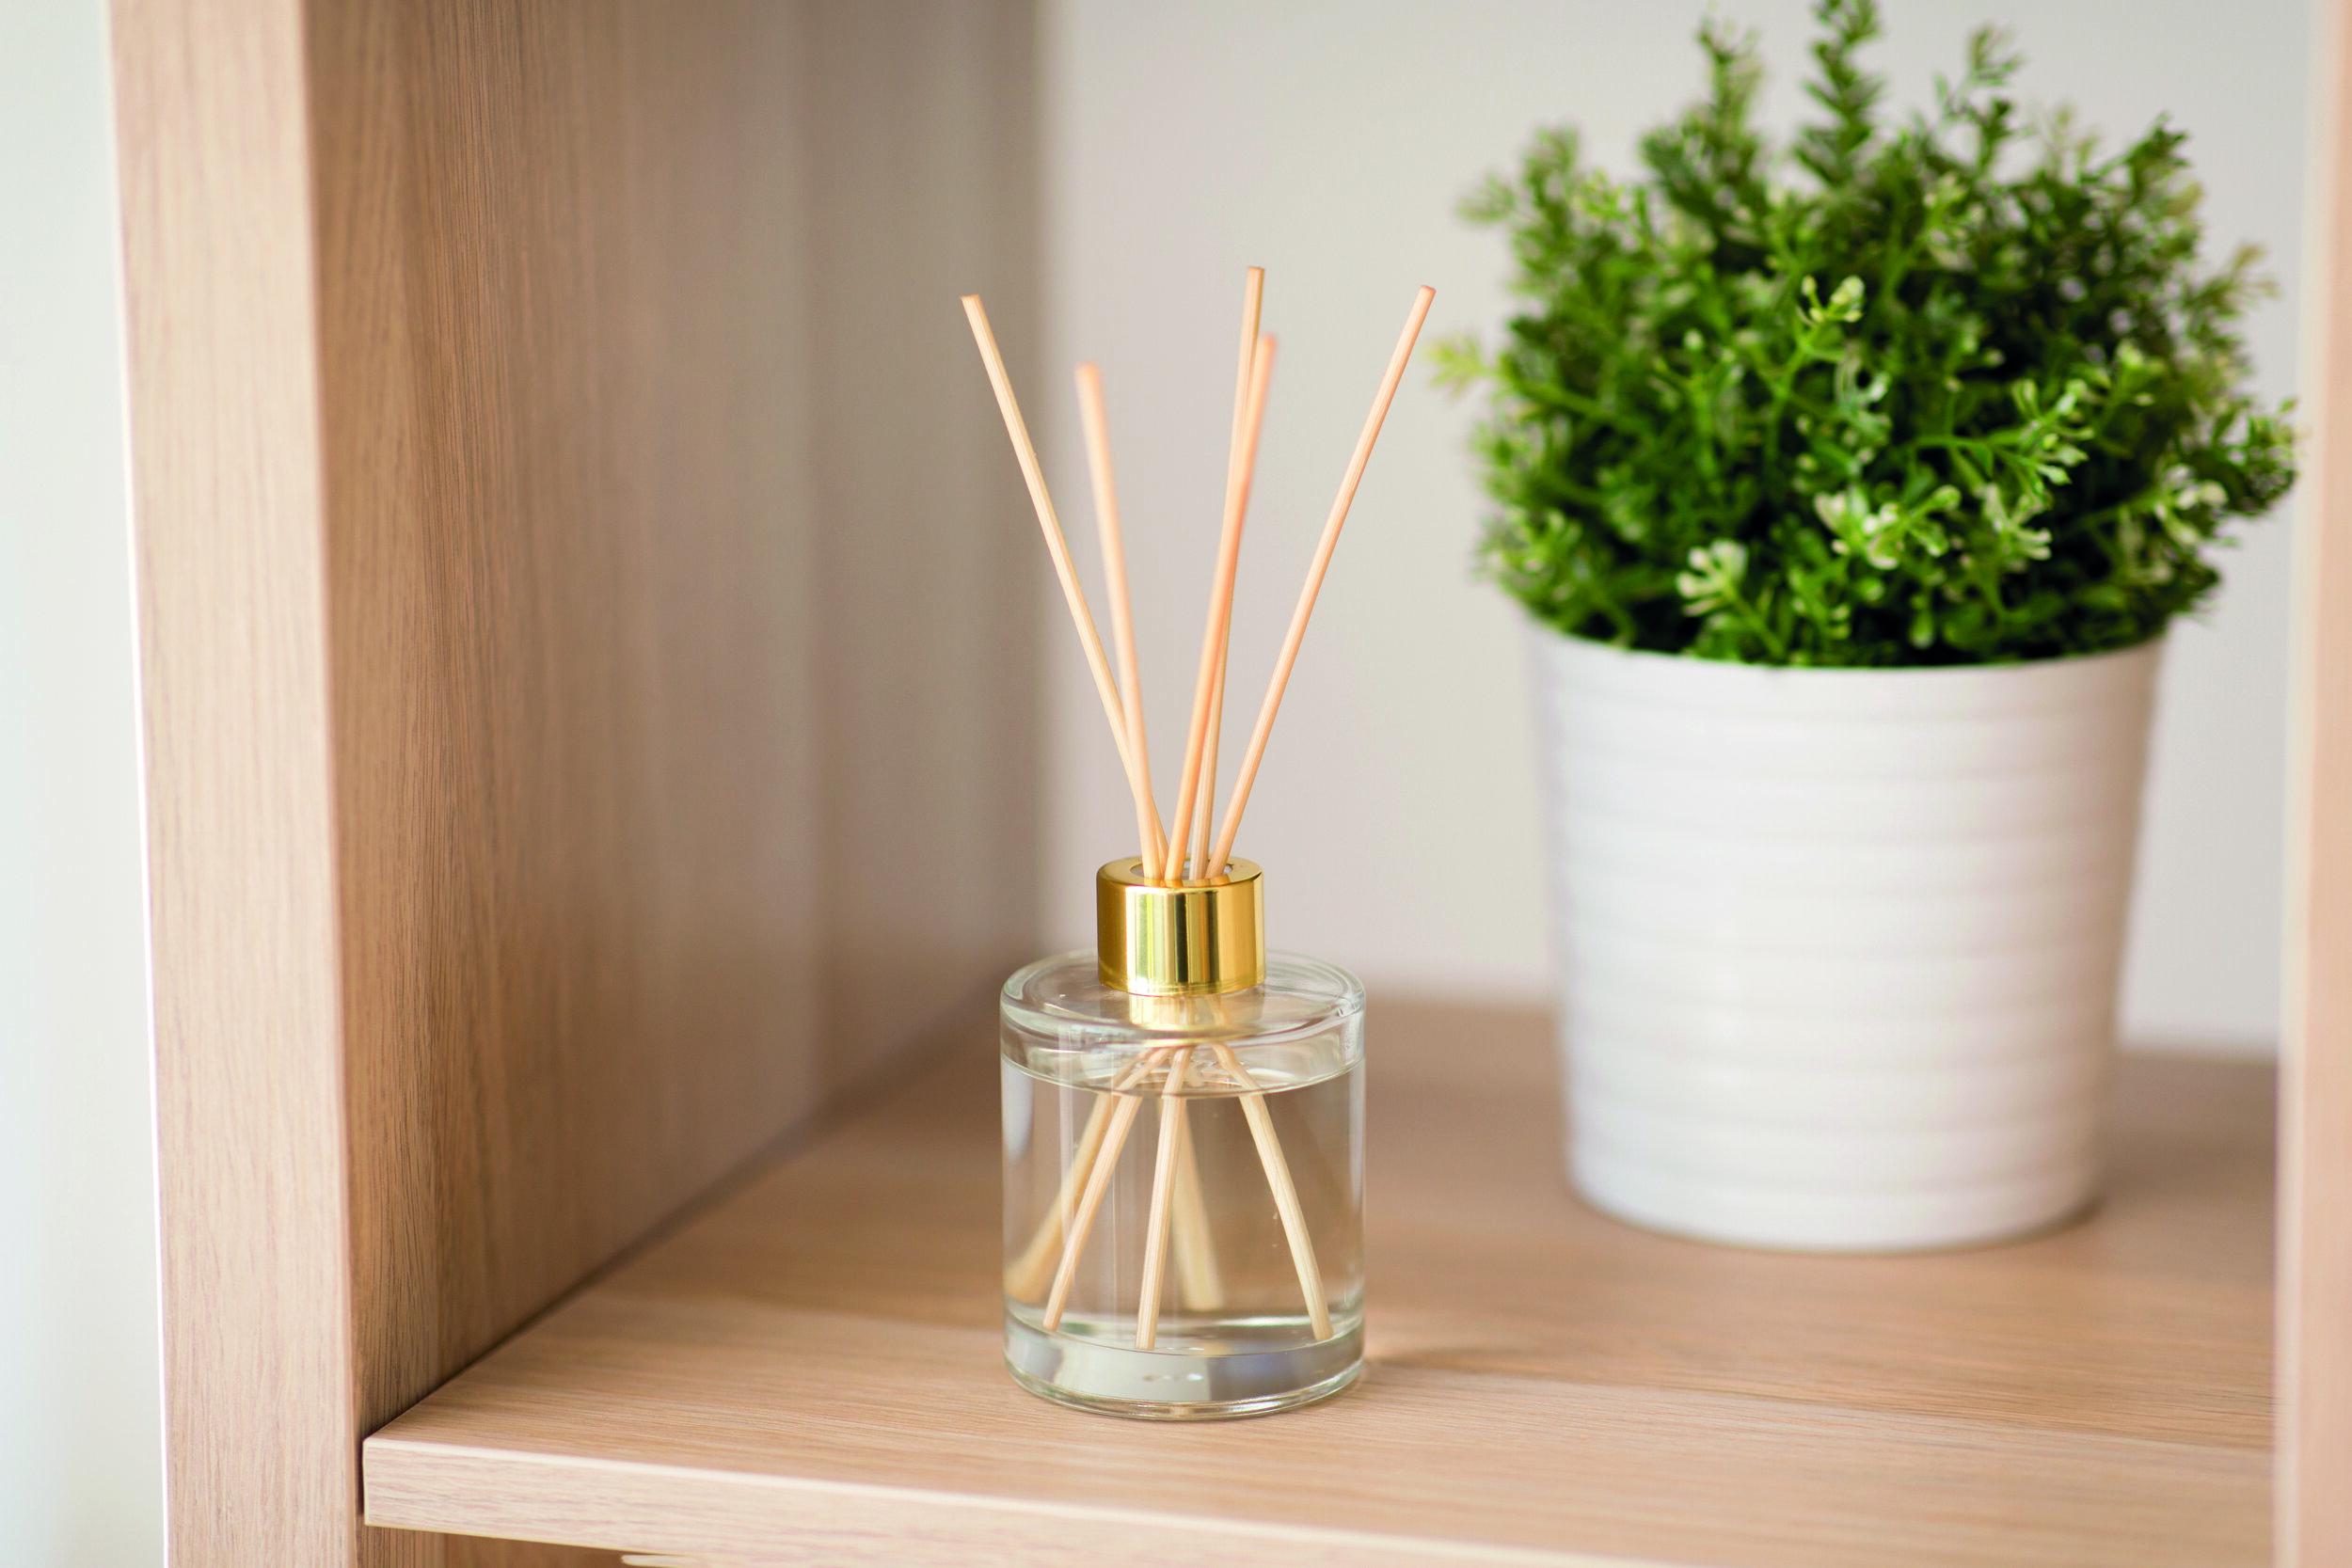 bigstock-aromatherapy-and-home-perfume--321851065.jpg